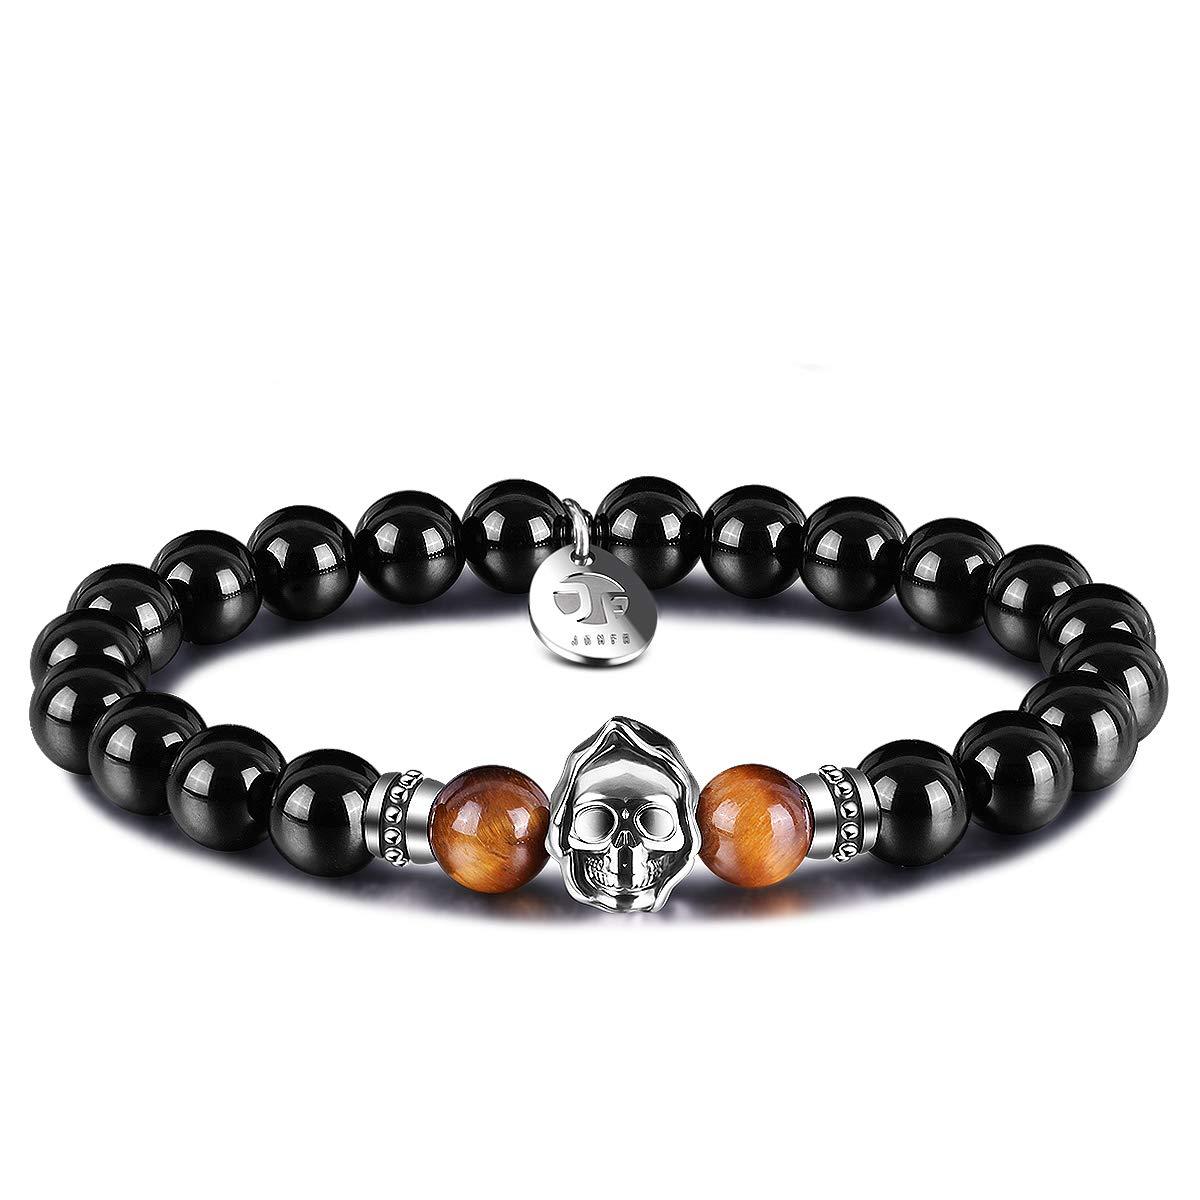 Relax Breathe Natural Agate Bracelet Beaded Meditation Spiritual Stretch Mantra Reiki Healing Energy Boho Charm Chakra Wrap Yoga Jewelry /& Gemstone Gifts Bamboo Leaf Agate